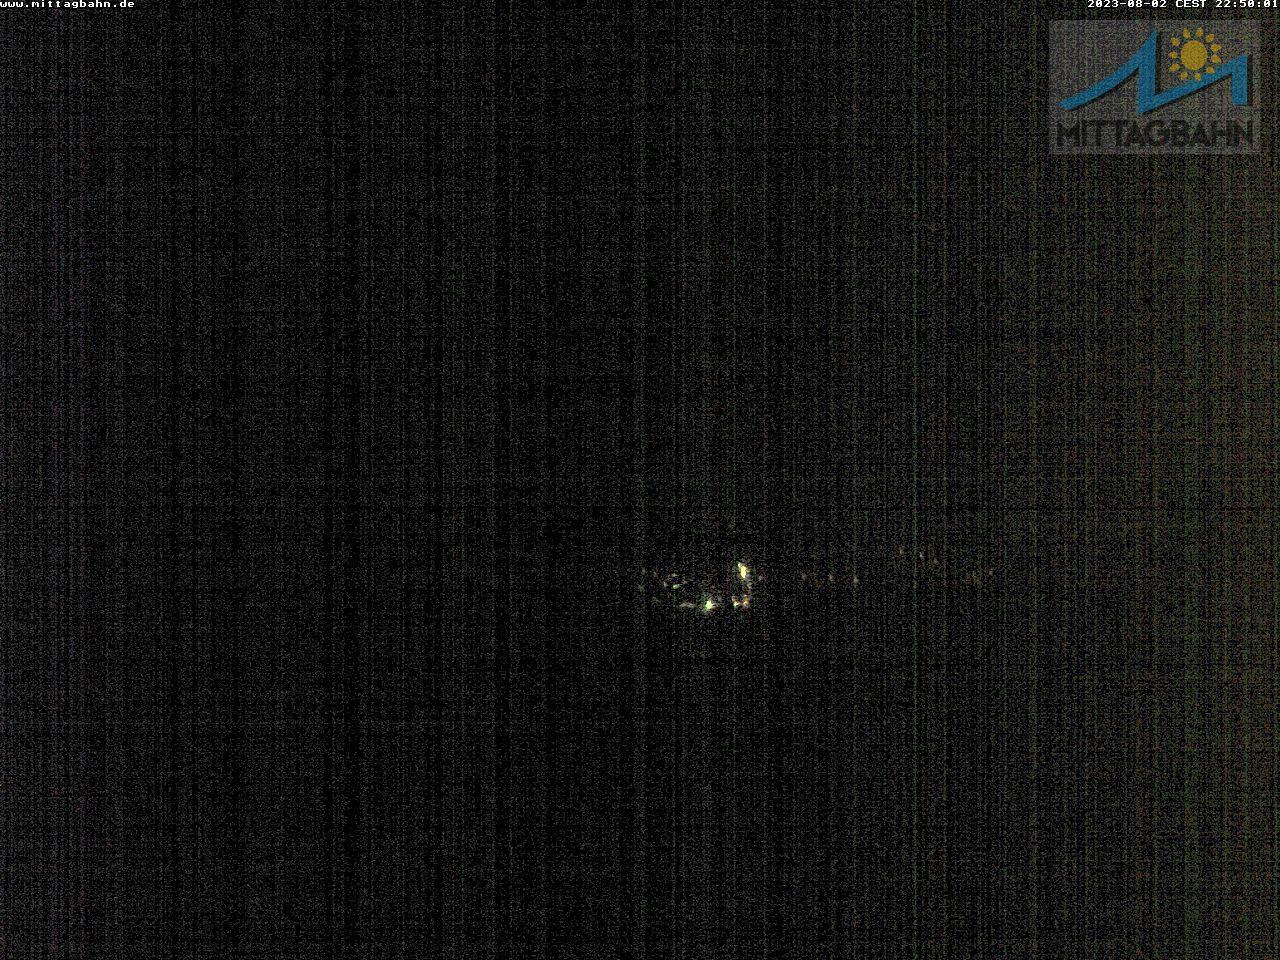 Webcam Ski Resort Immenstadt - Mittag cam 7 - Bavaria Alps - Allgäu